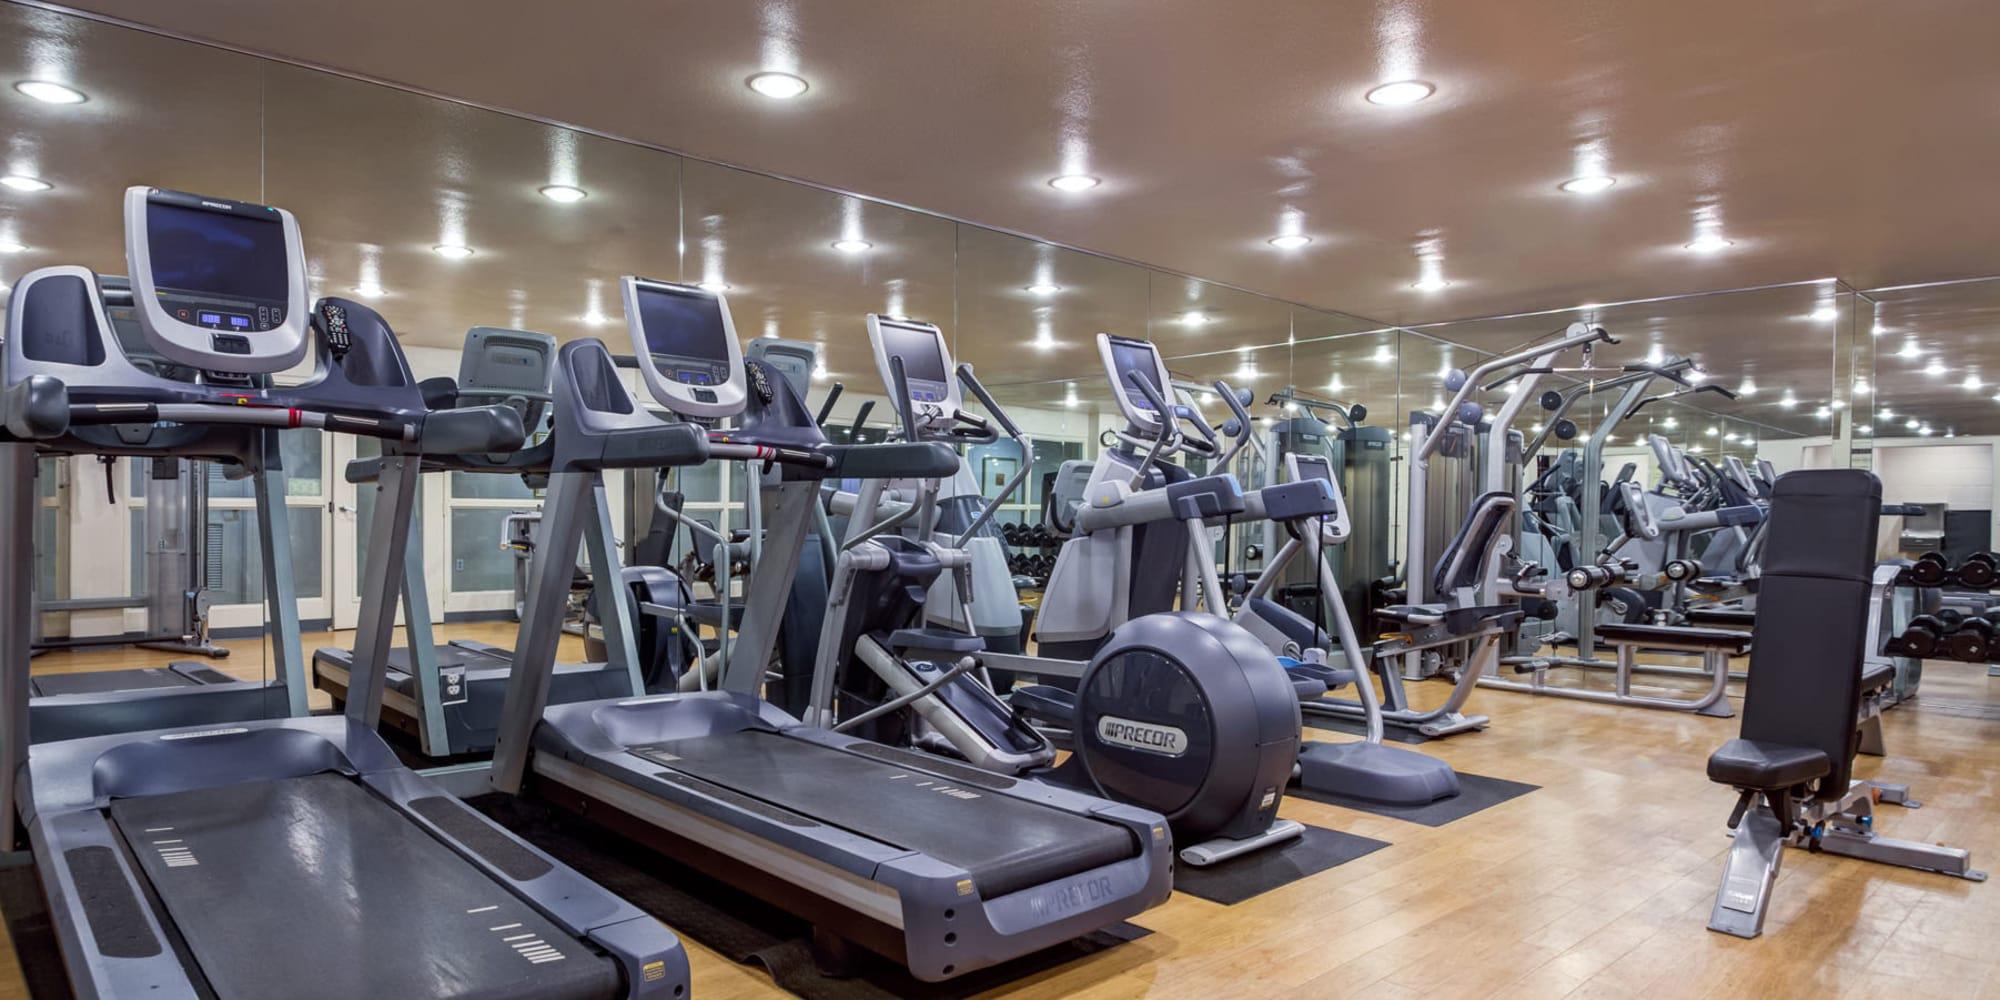 Cardio equipment galore in the onsite fitness center at L'Estancia in Studio City, California